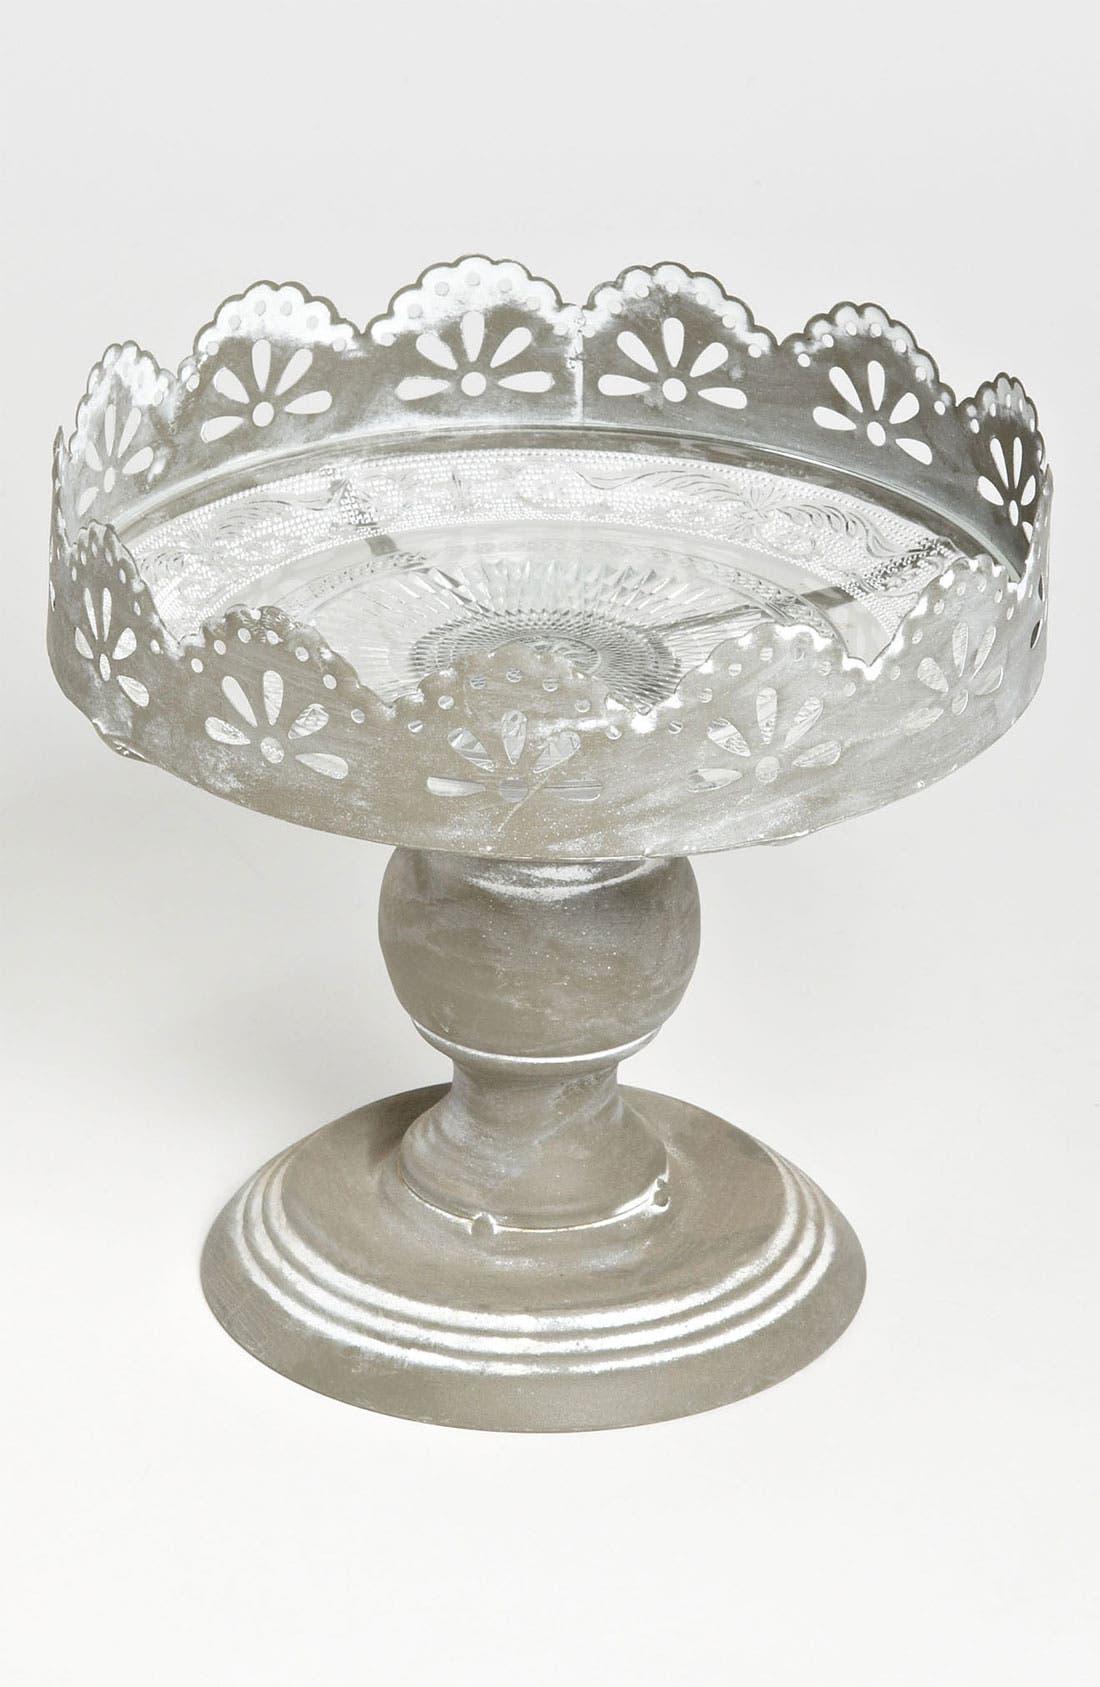 Alternate Image 1 Selected - Metal & Glass Pedestal Plate, Small